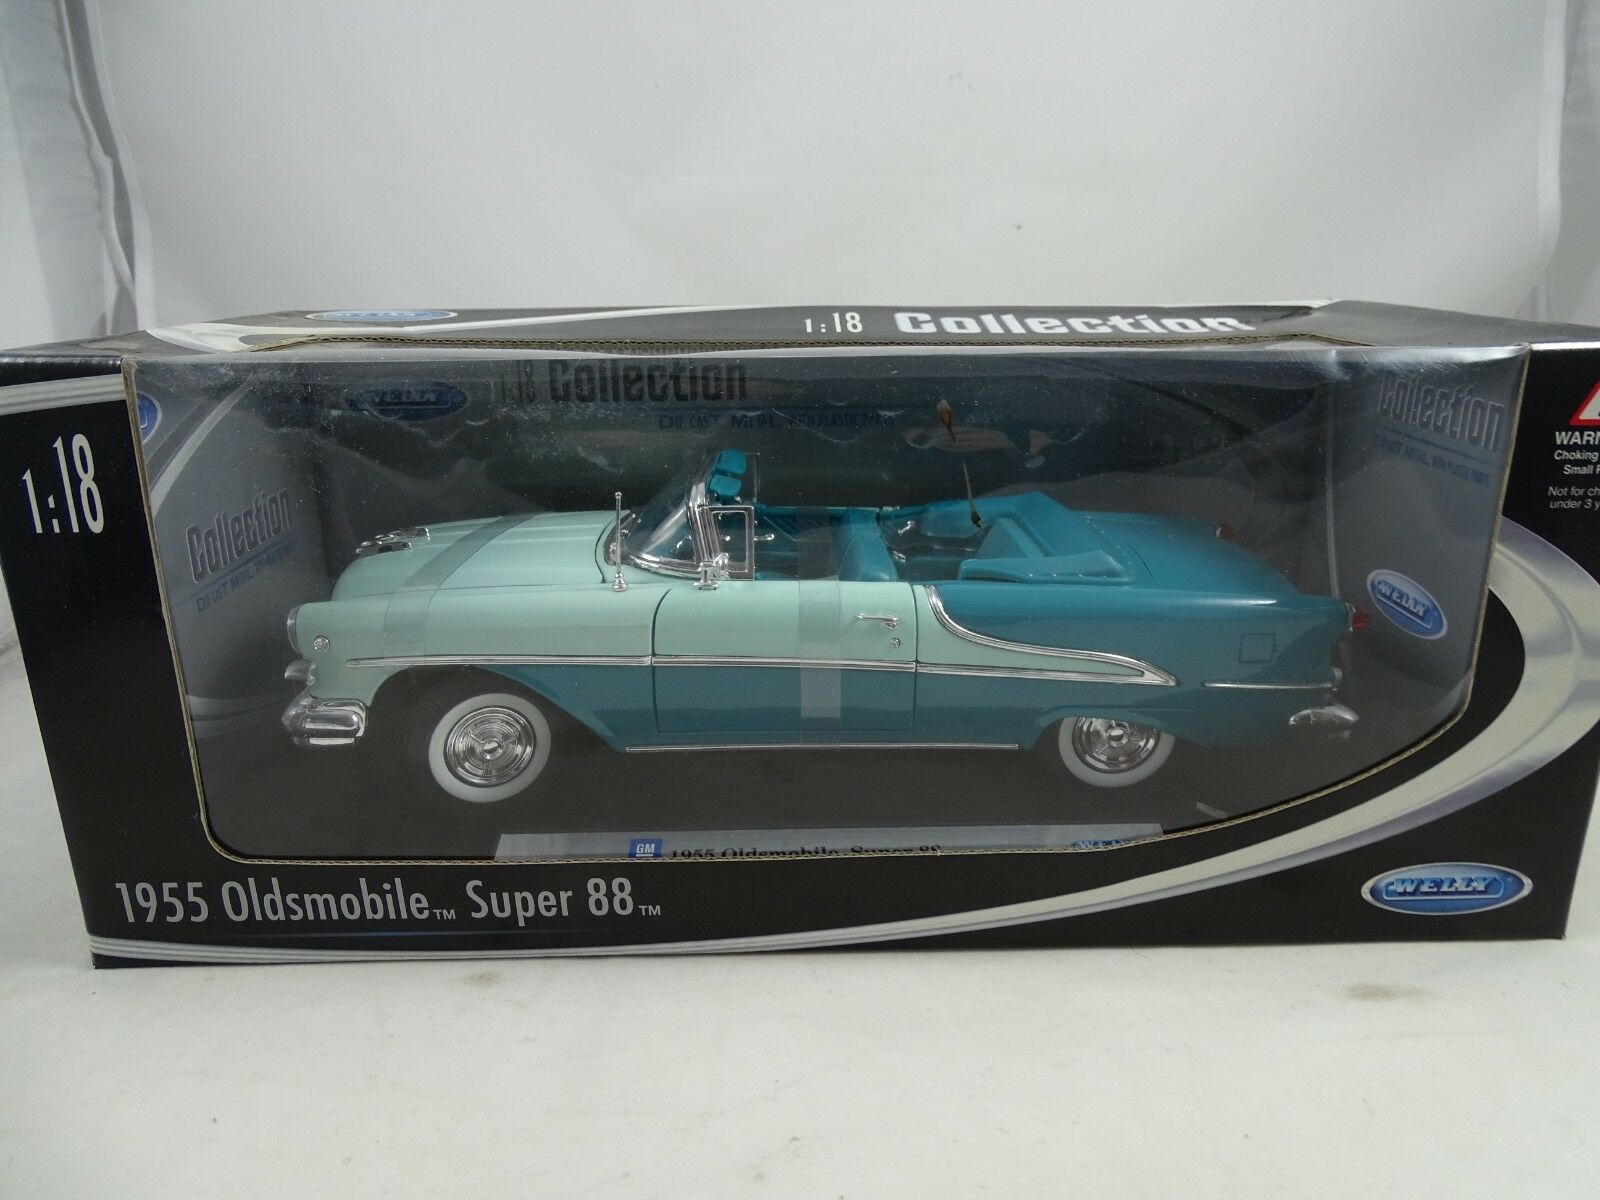 1 18 Welly 1955 OLDSMOBILE SUPER 88 Bleu ciel turquoise  19869w - RARE §